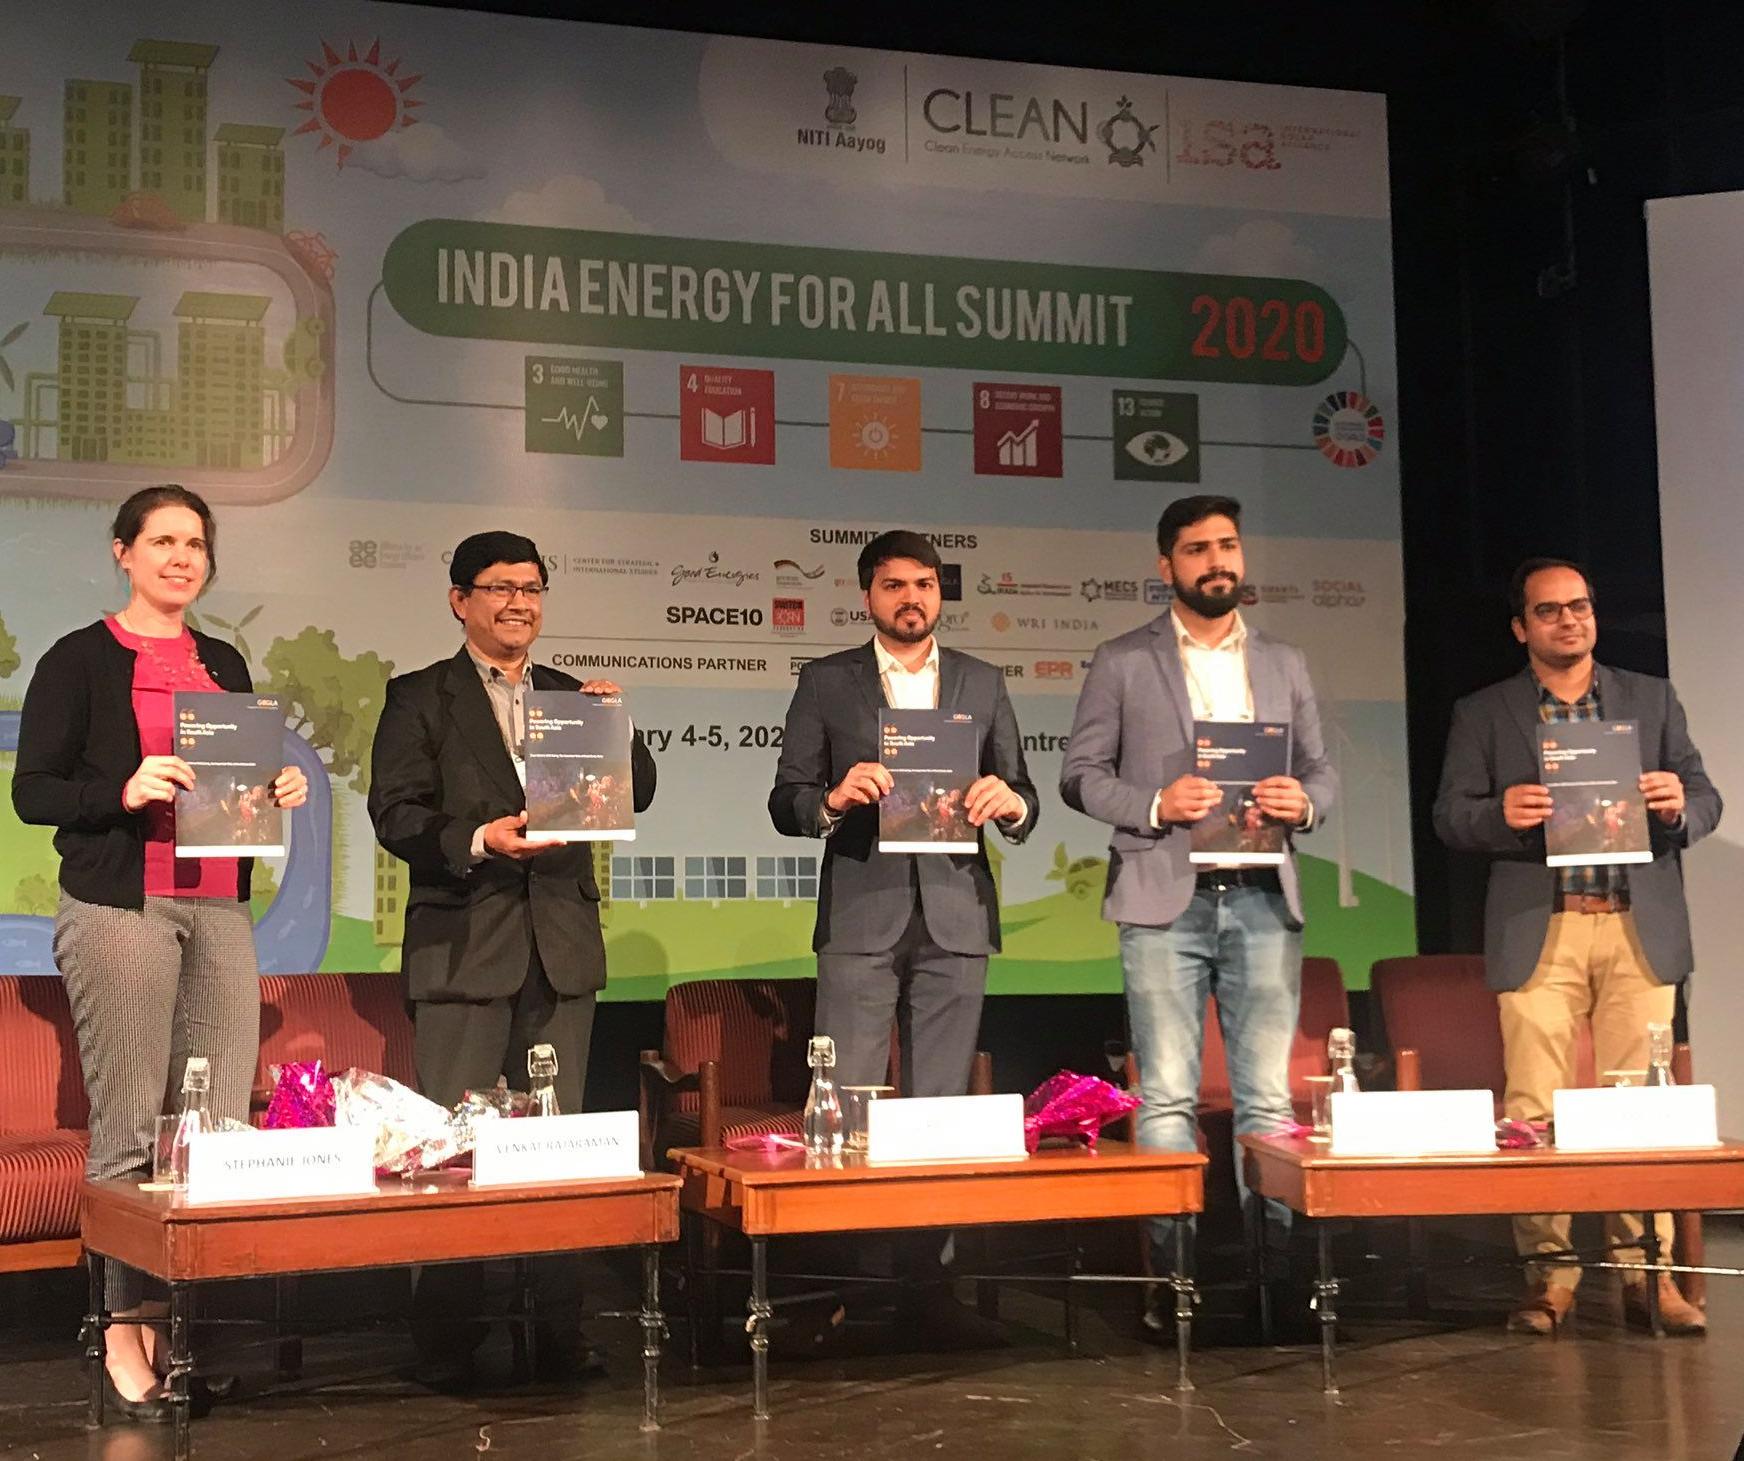 India Energy summit